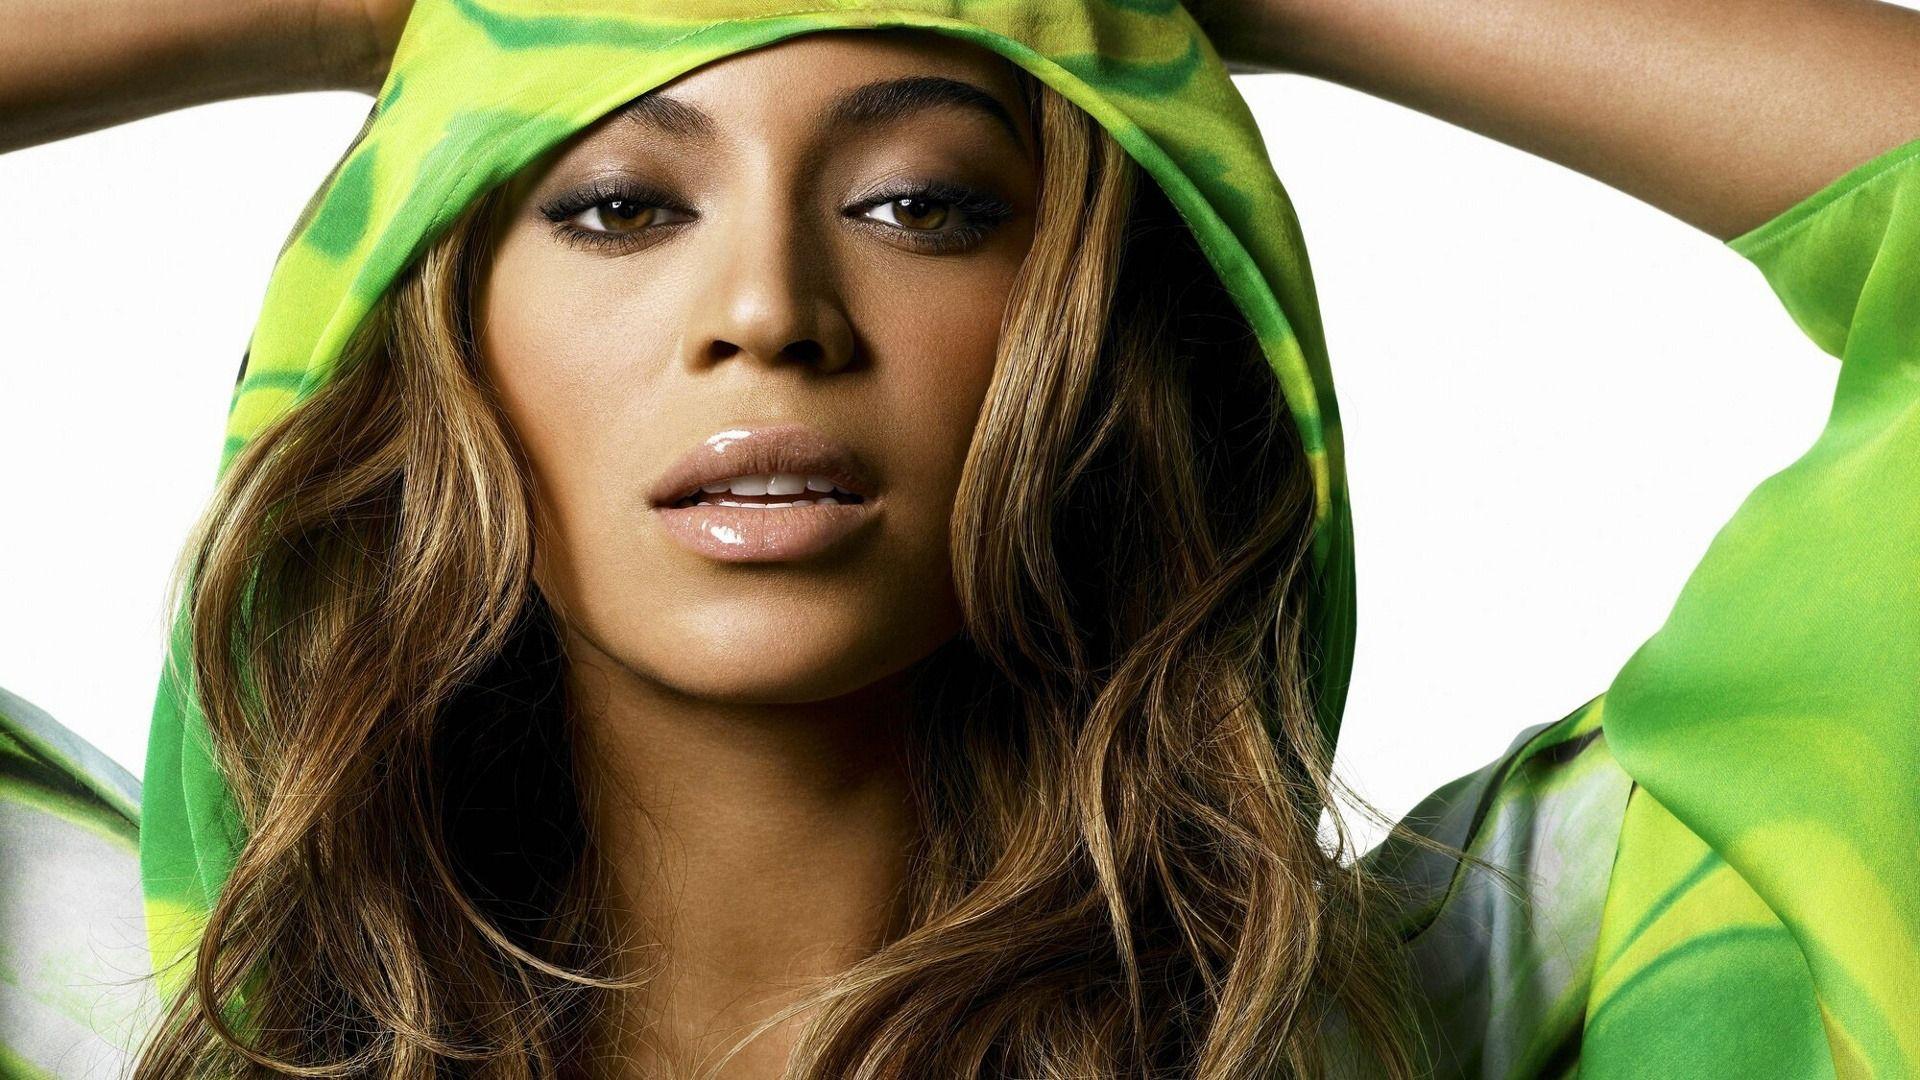 Download Wallpaper 1920x1080 Beyonce Dress Haircut Lips Look Full Hd 1080p Hd Background Beyonce Knowles Beyonce Celebrities Female